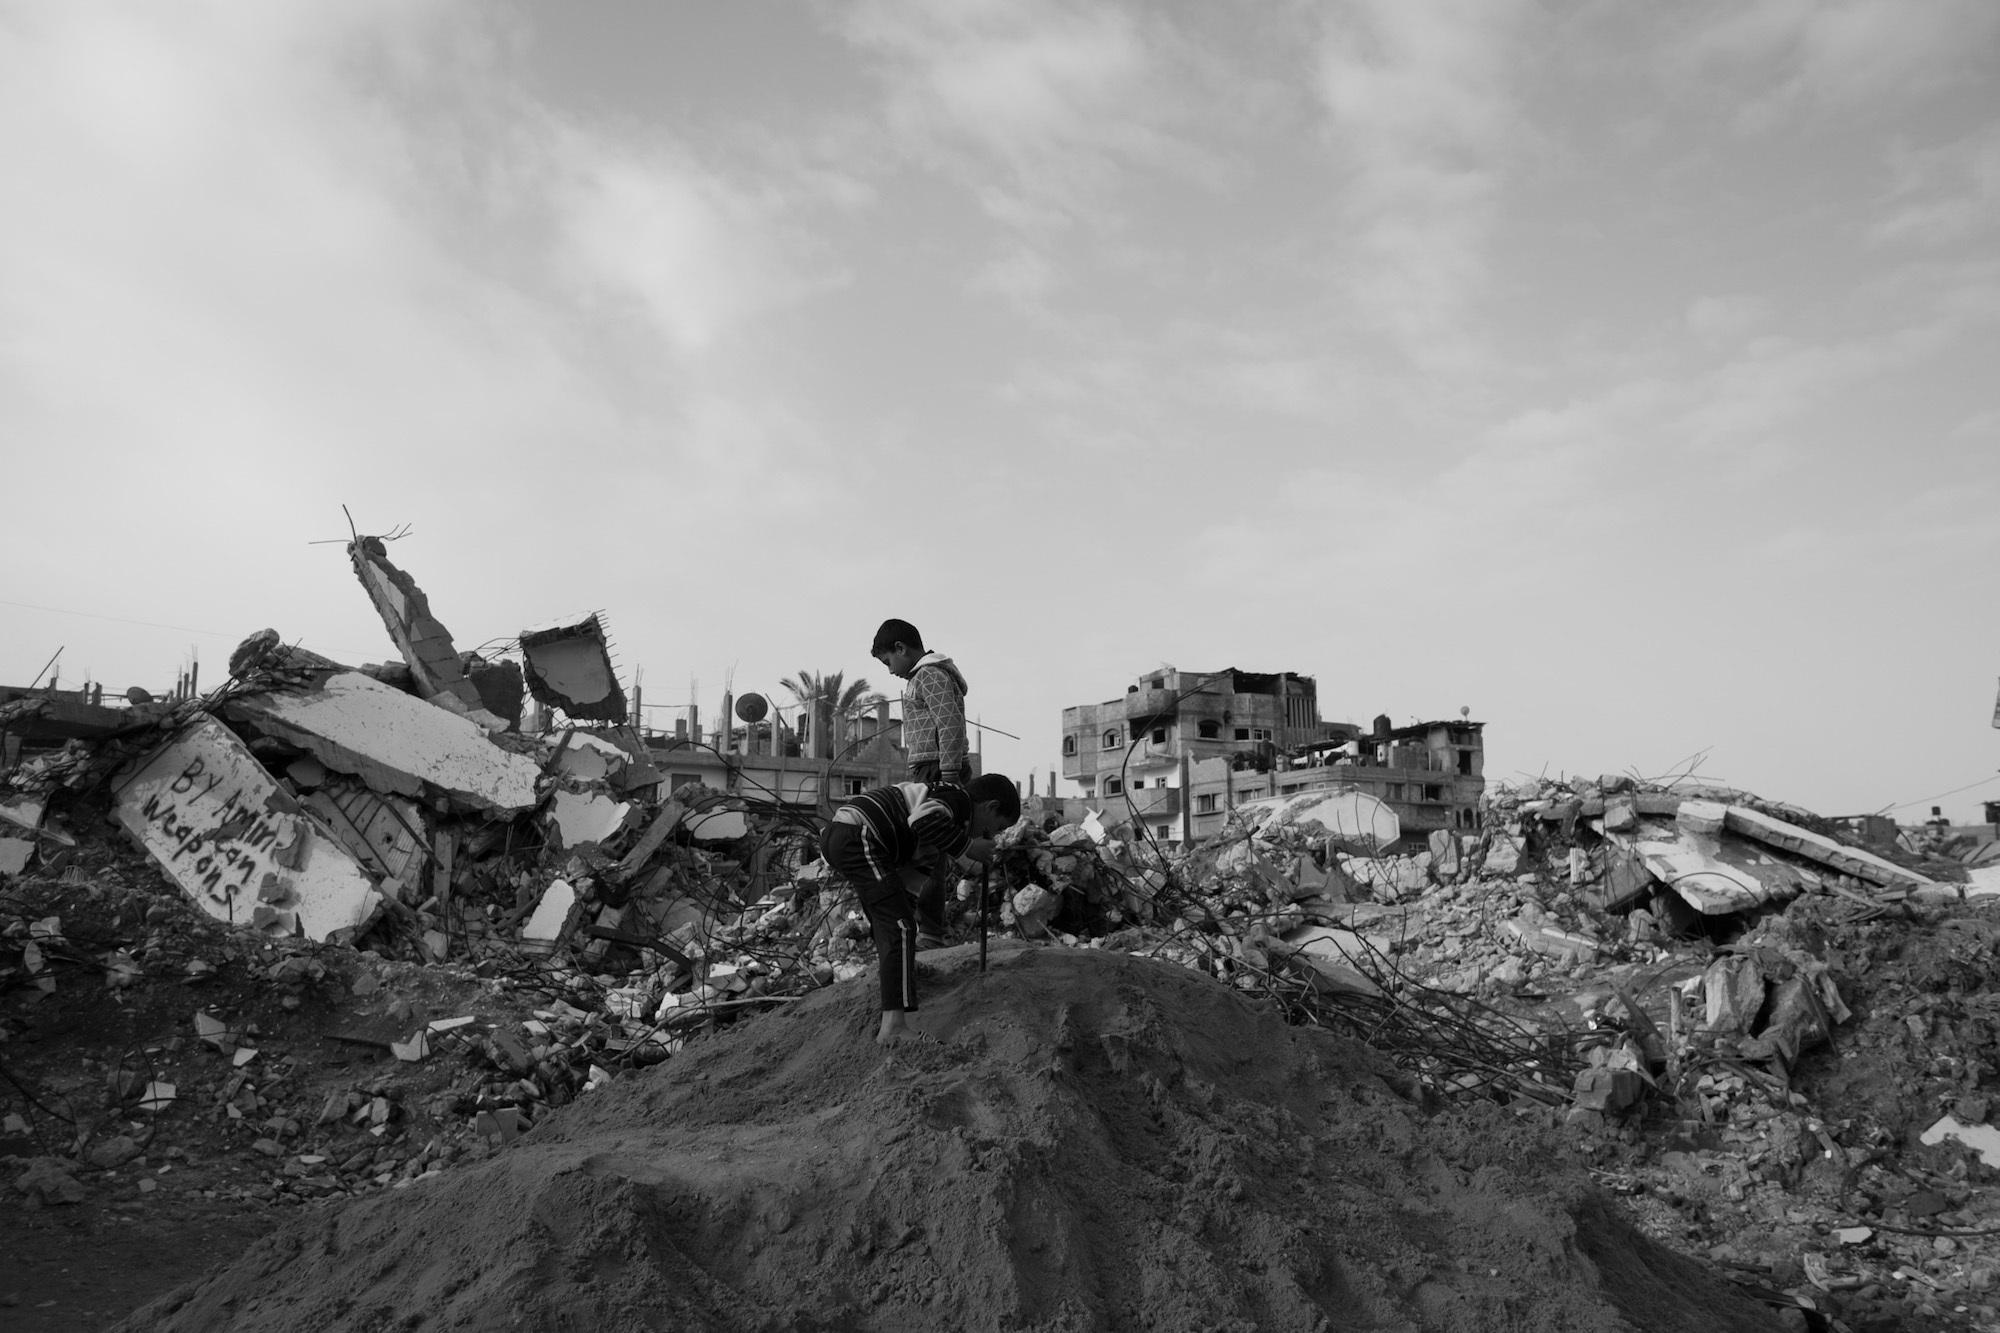 photos-of-the-opiate-epidemic-thats-ravaged-gaza-343-1474566512.jpg